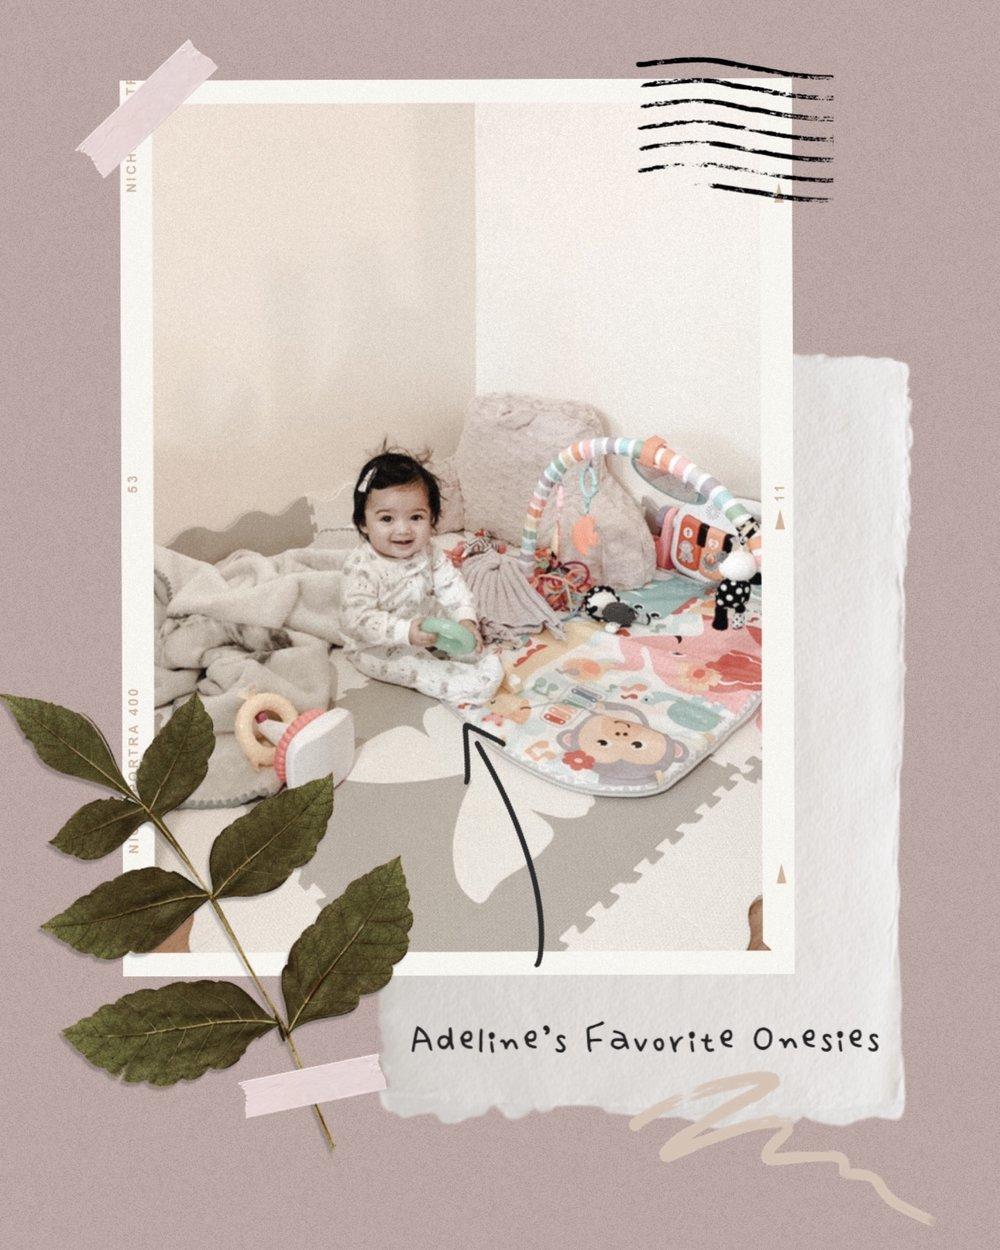 5 Must-Have Baby Onesies